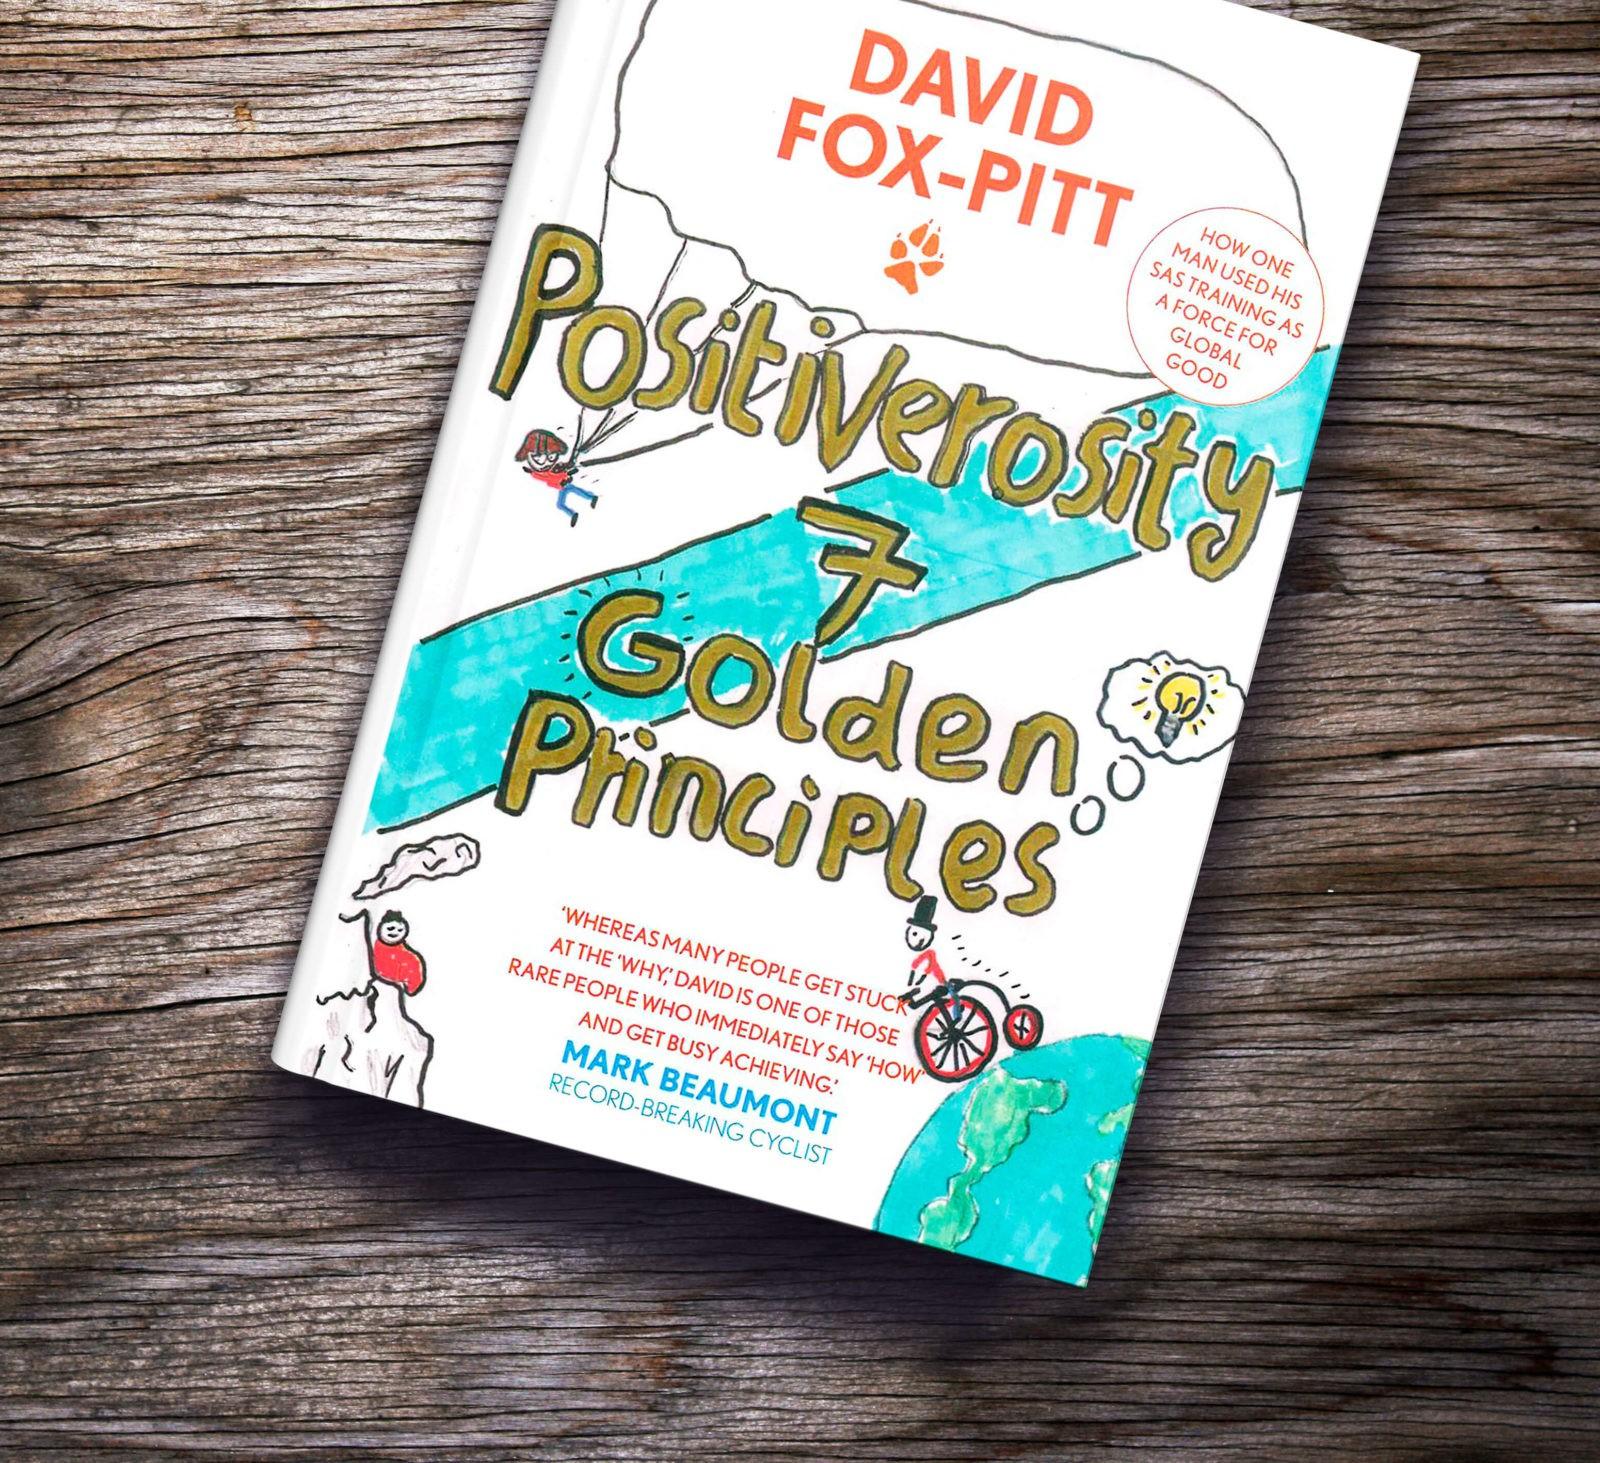 Posiverosity Book